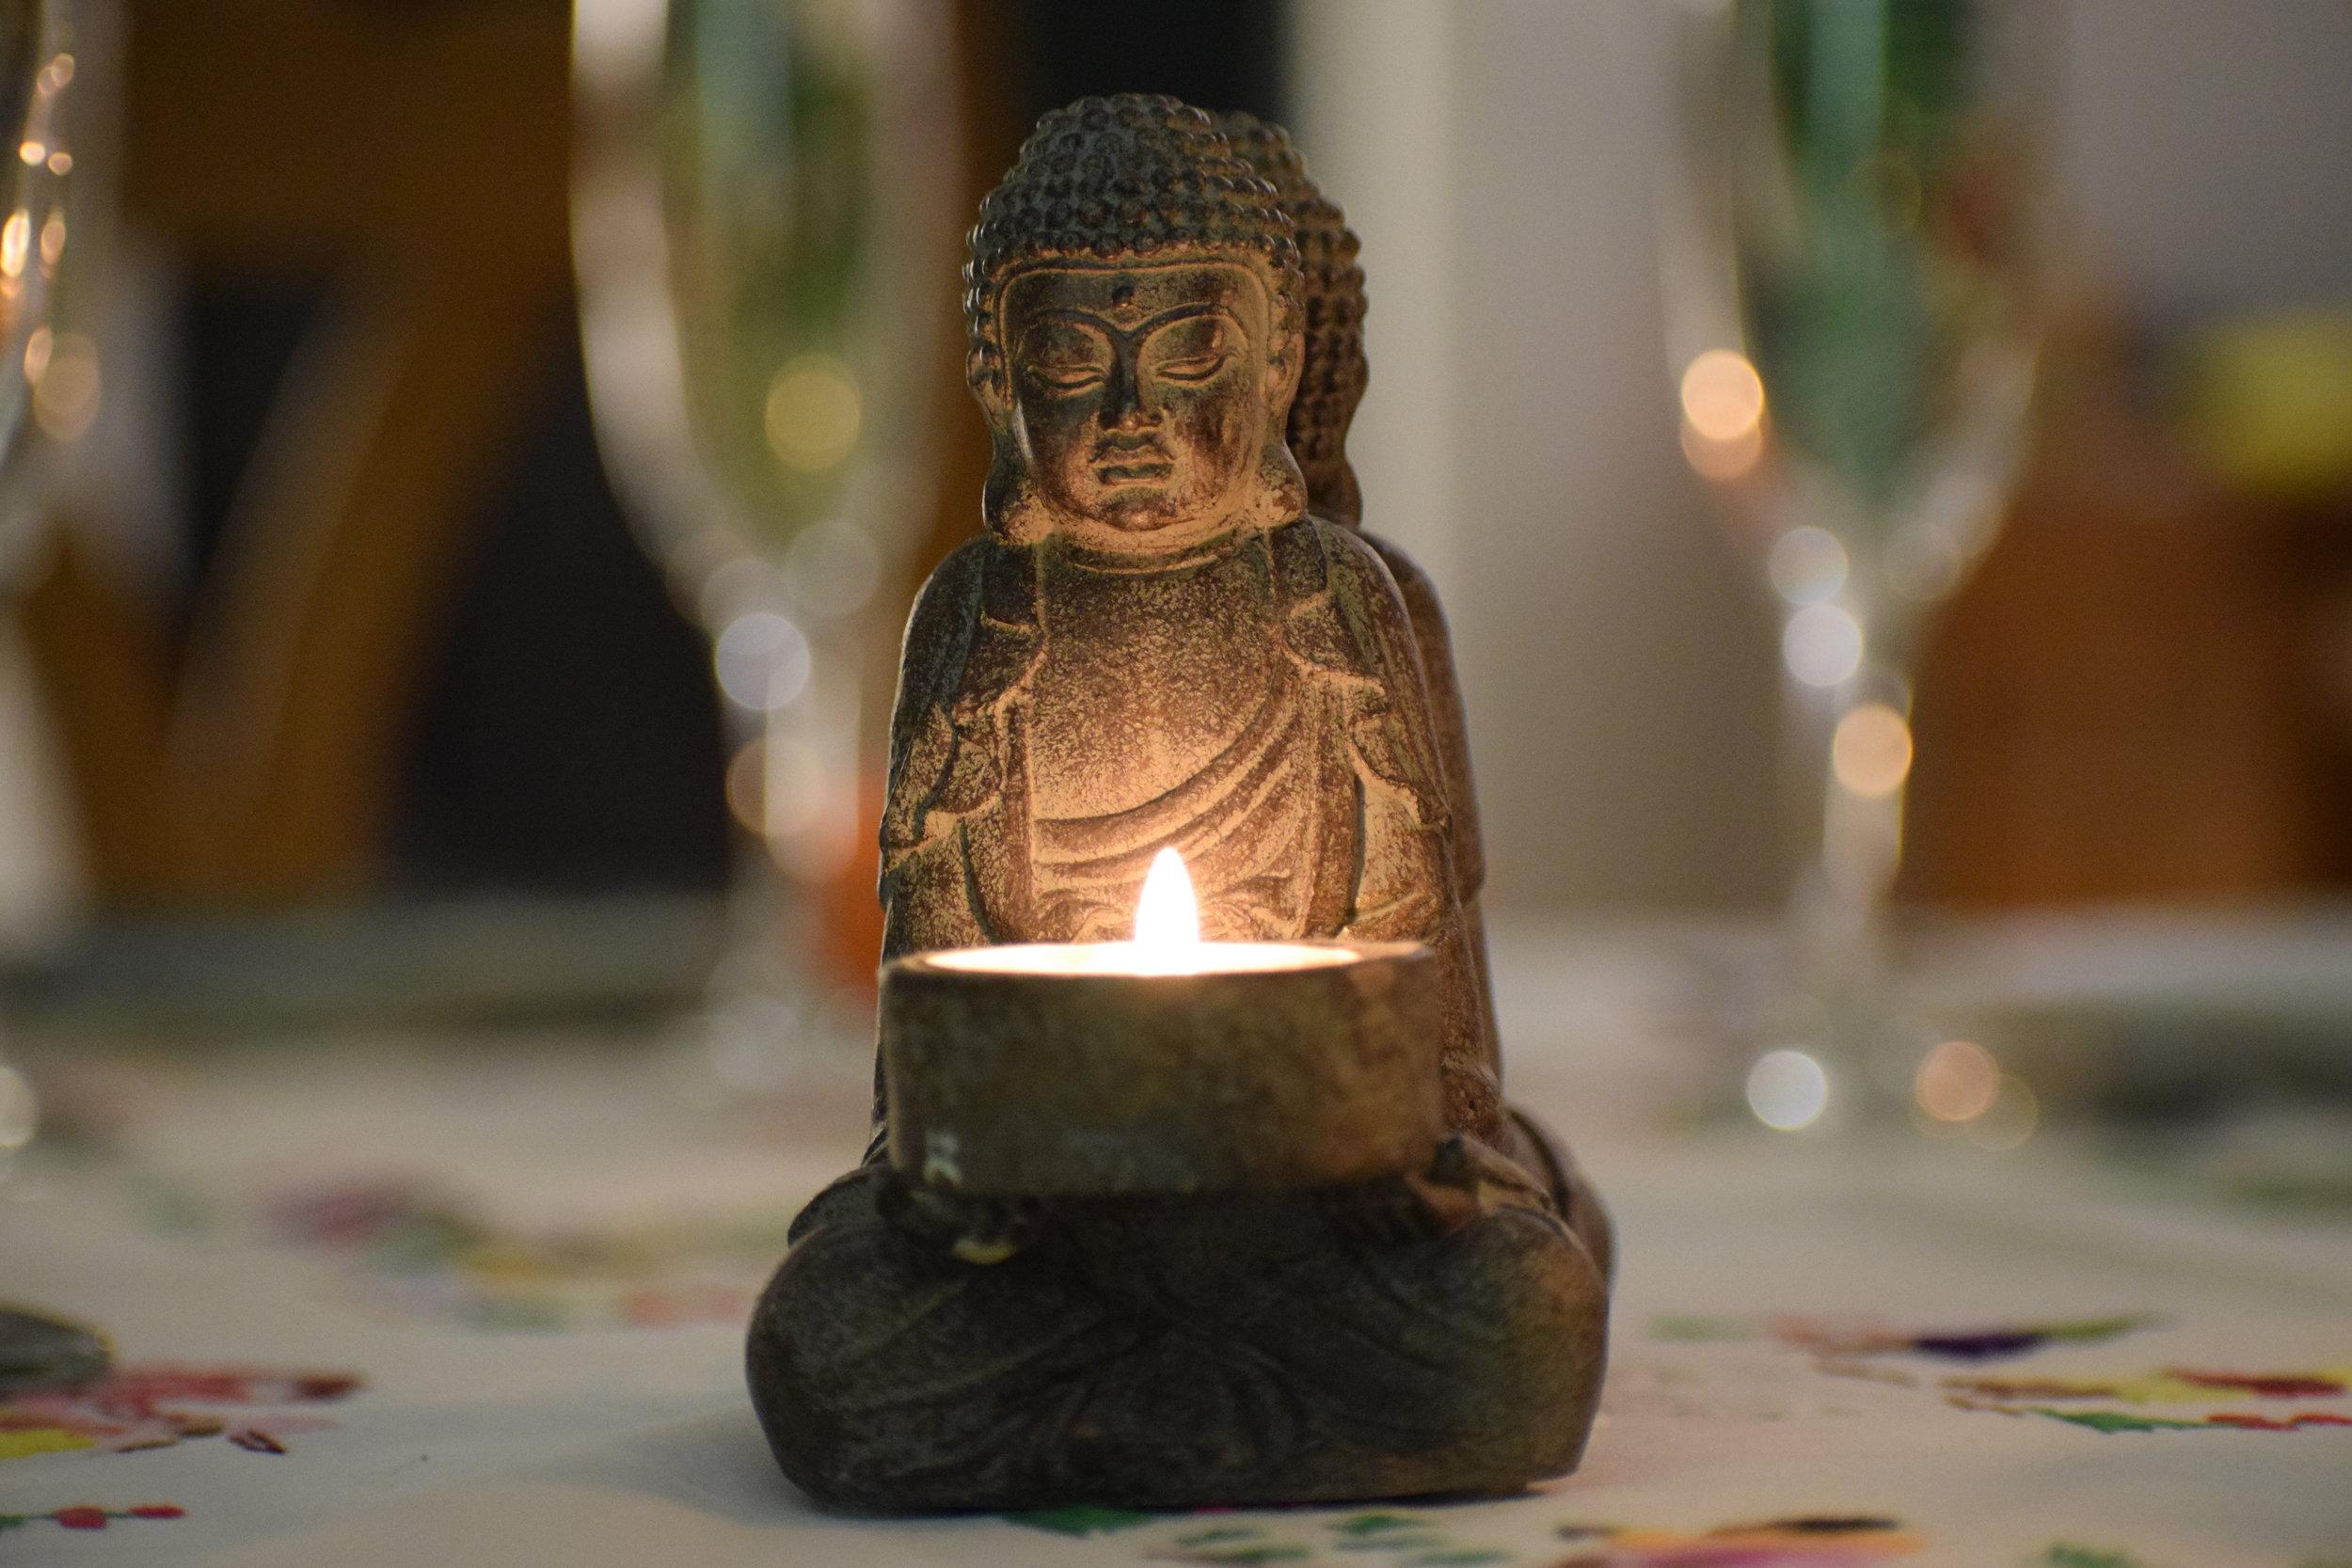 Illuminating Our Self